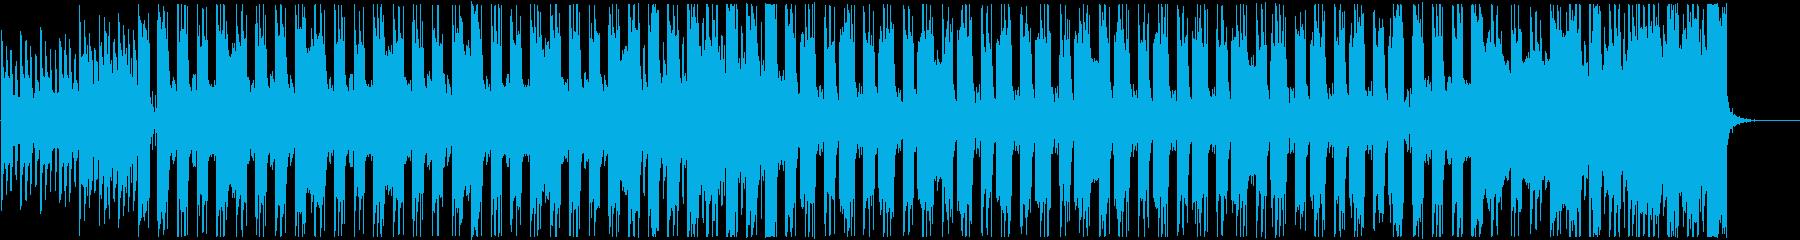 Wild EDM_Future Bass's reproduced waveform